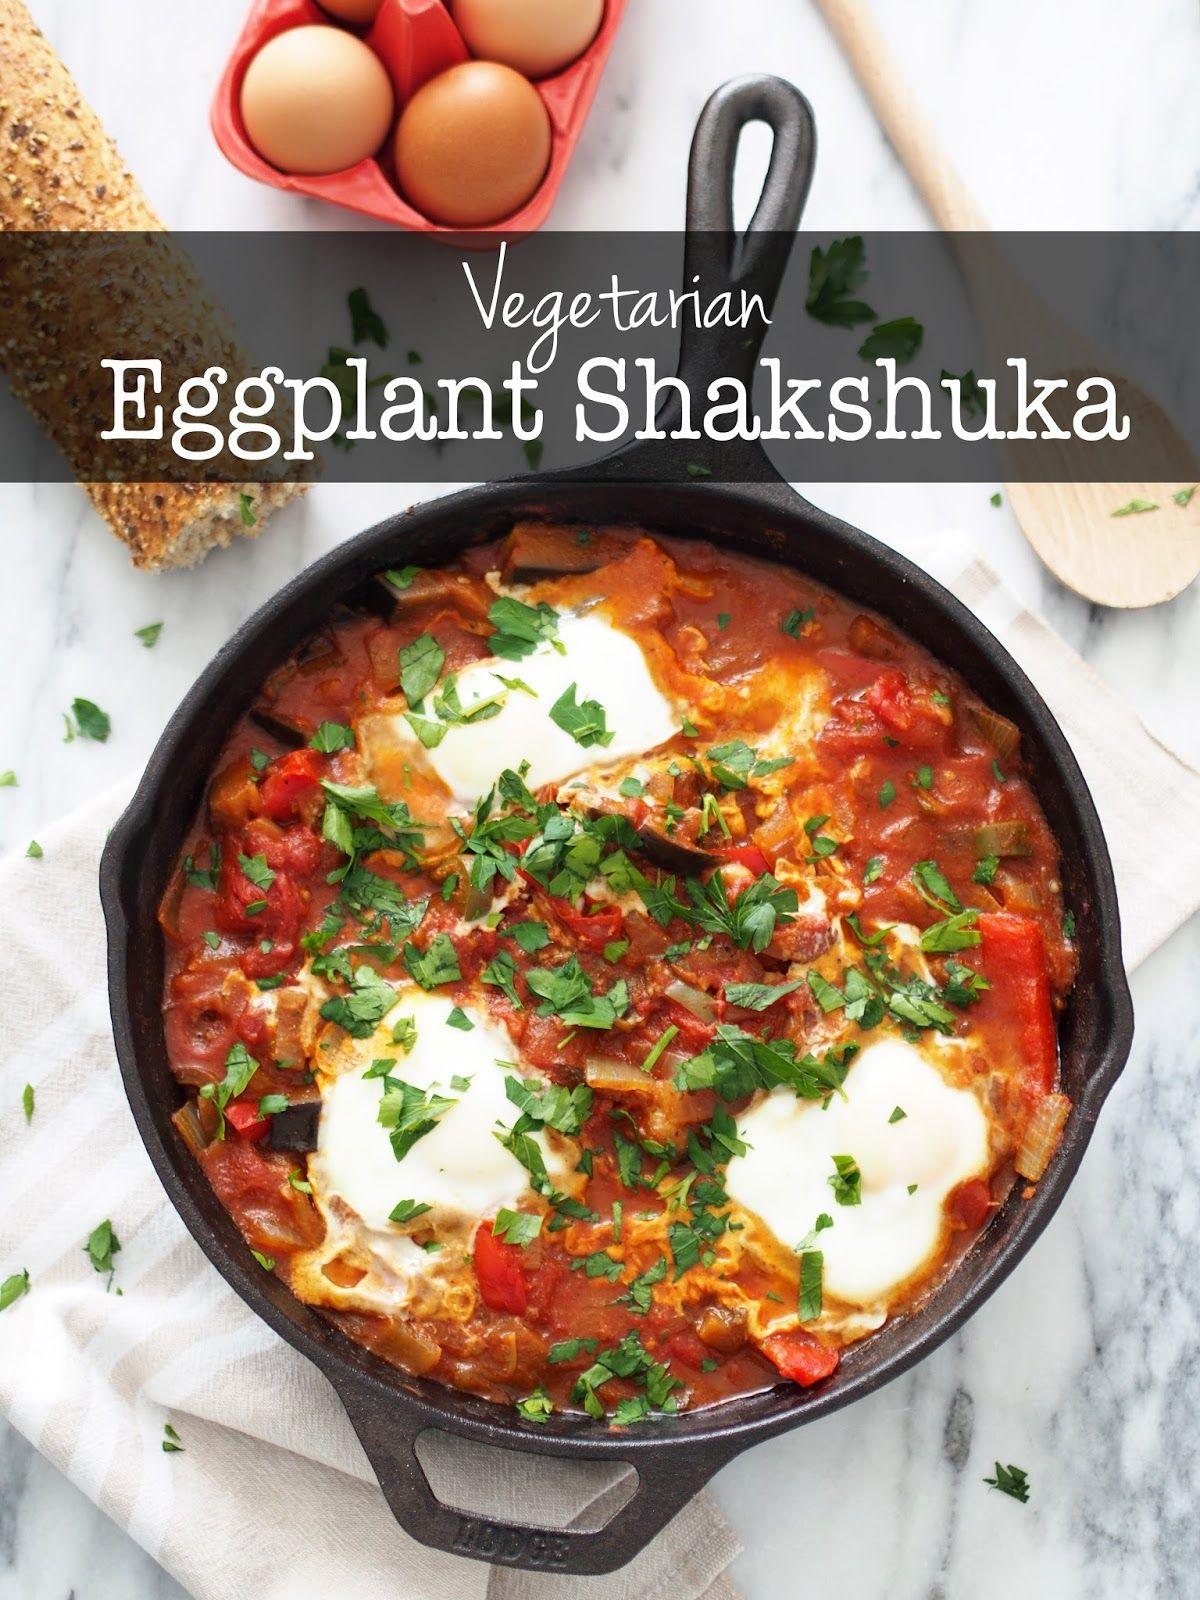 Vegetarian eggplant shakshuka a healthy hearty israeli dish vegetarian eggplant shakshuka a healthy hearty israeli dish typical domestic babe forumfinder Choice Image